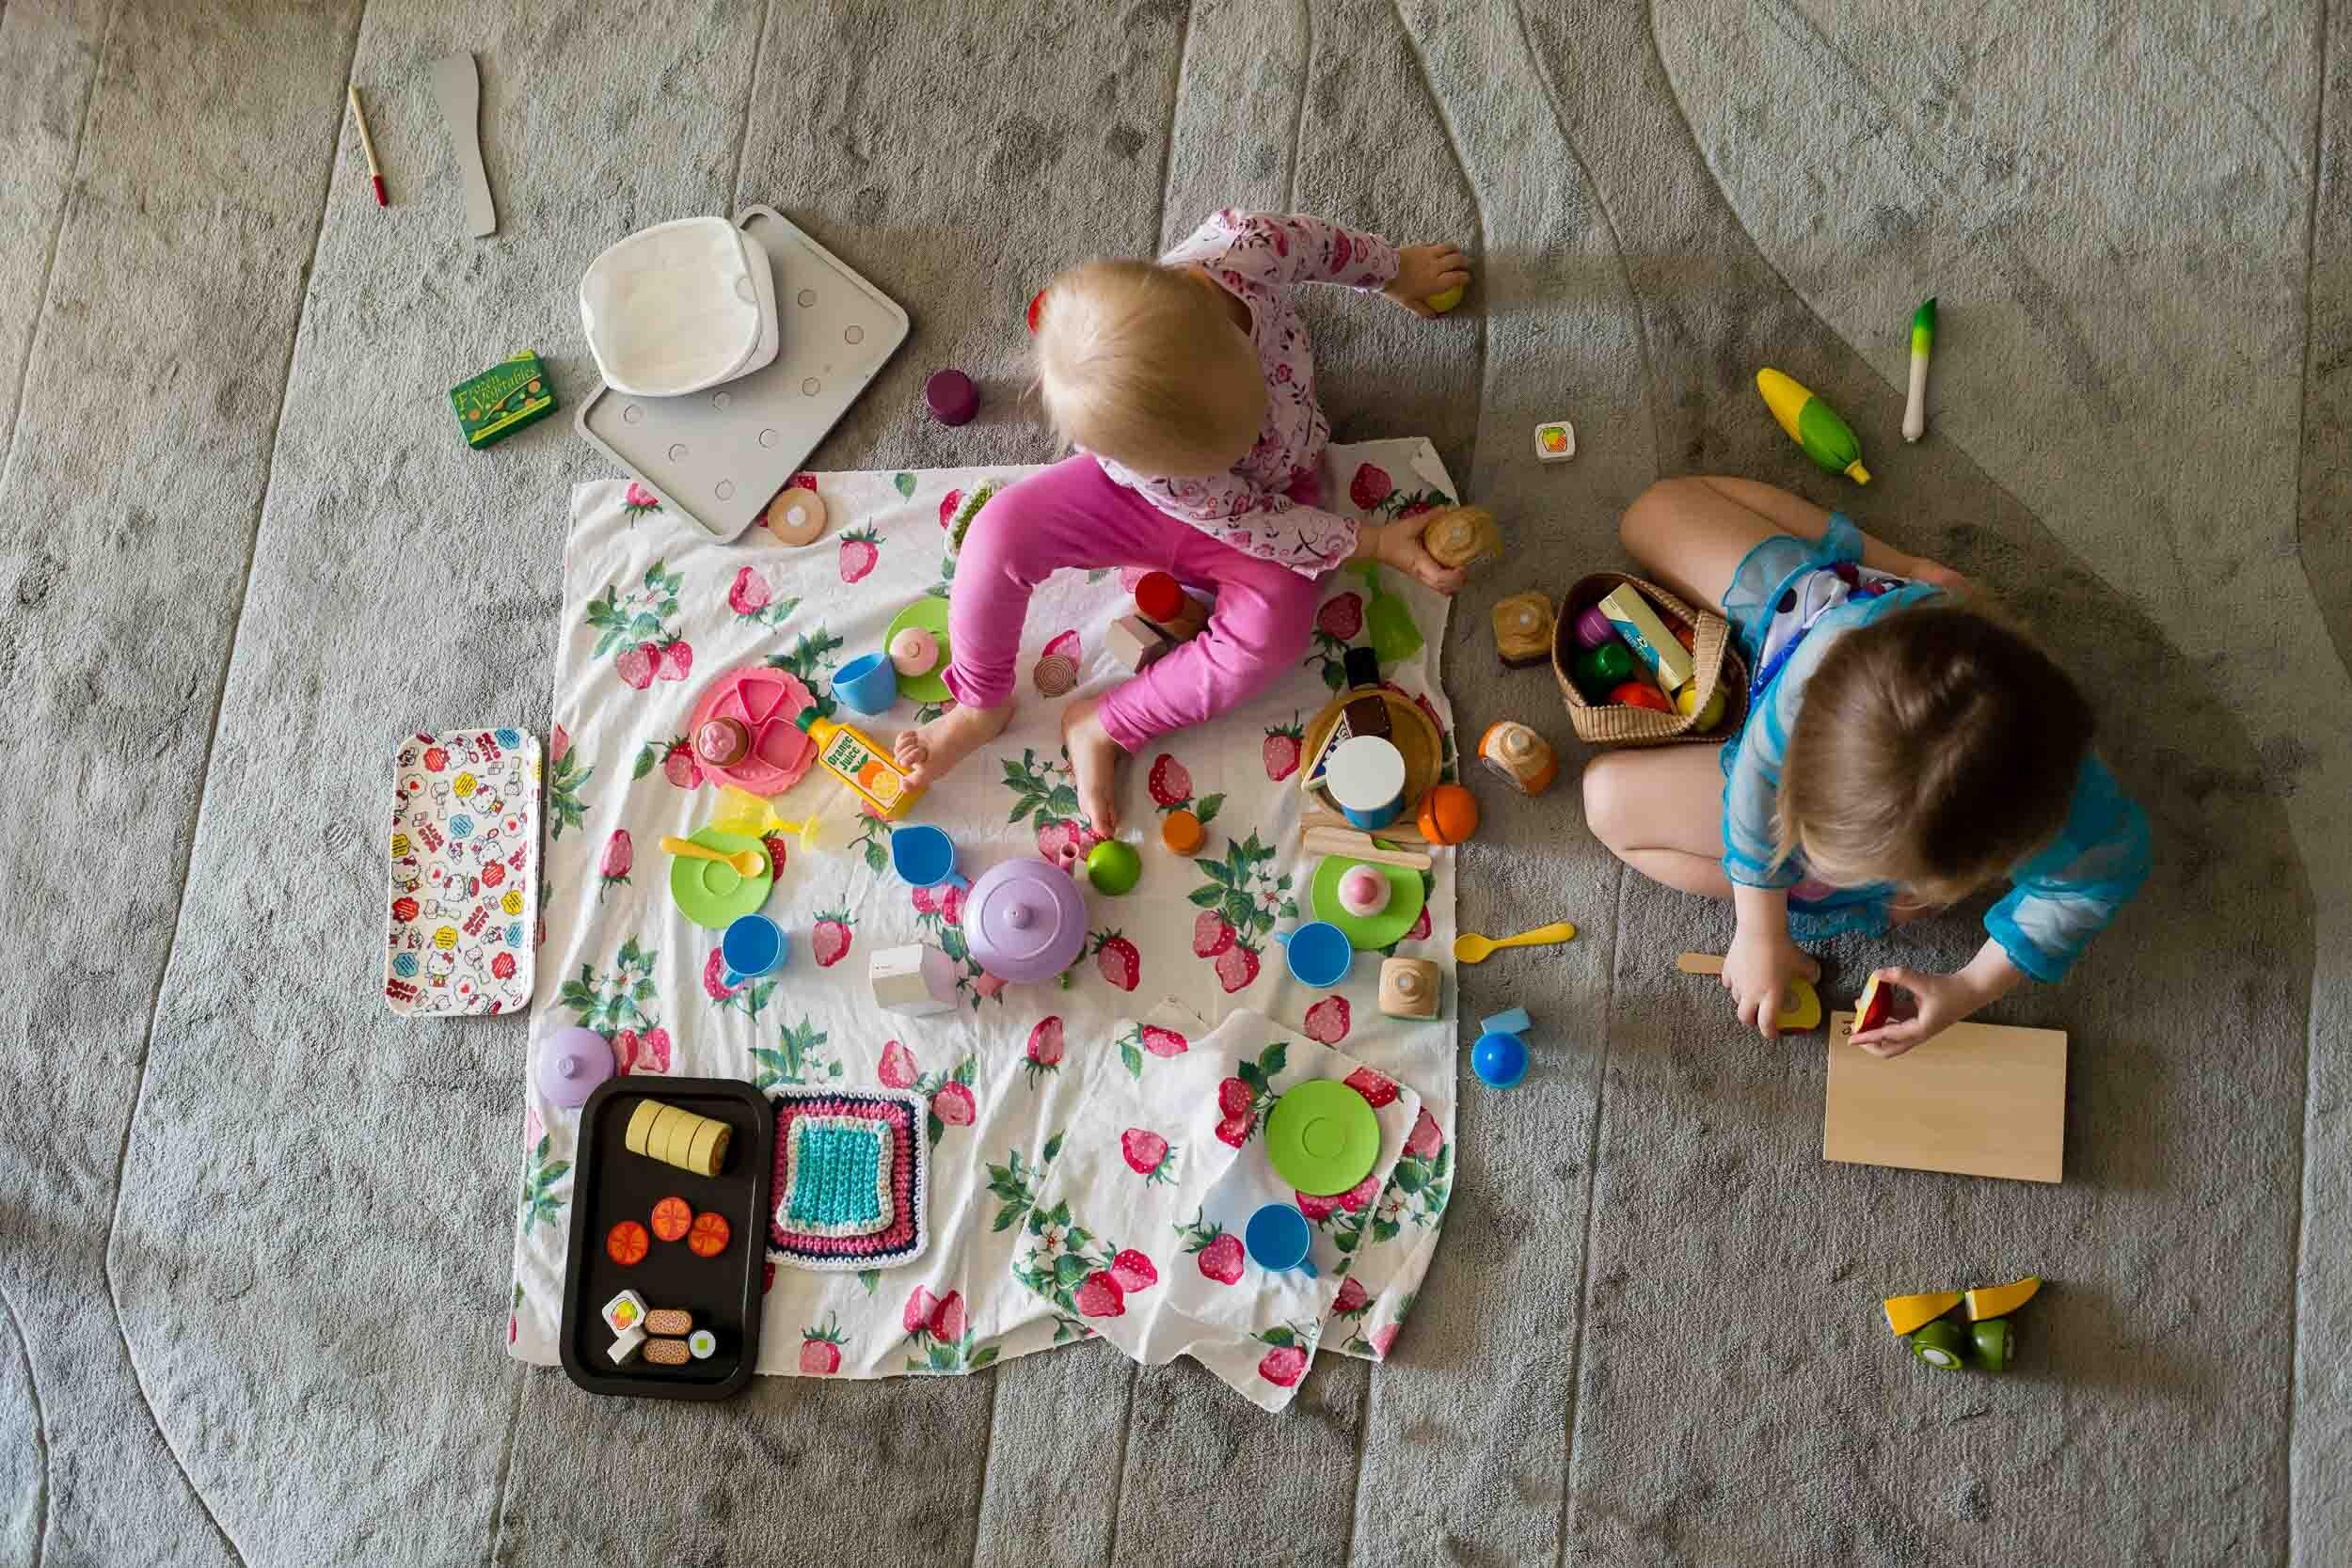 In-Home-childrens-photography-portland-oregon-rebecca-hunnicutt-farren-3.jpg